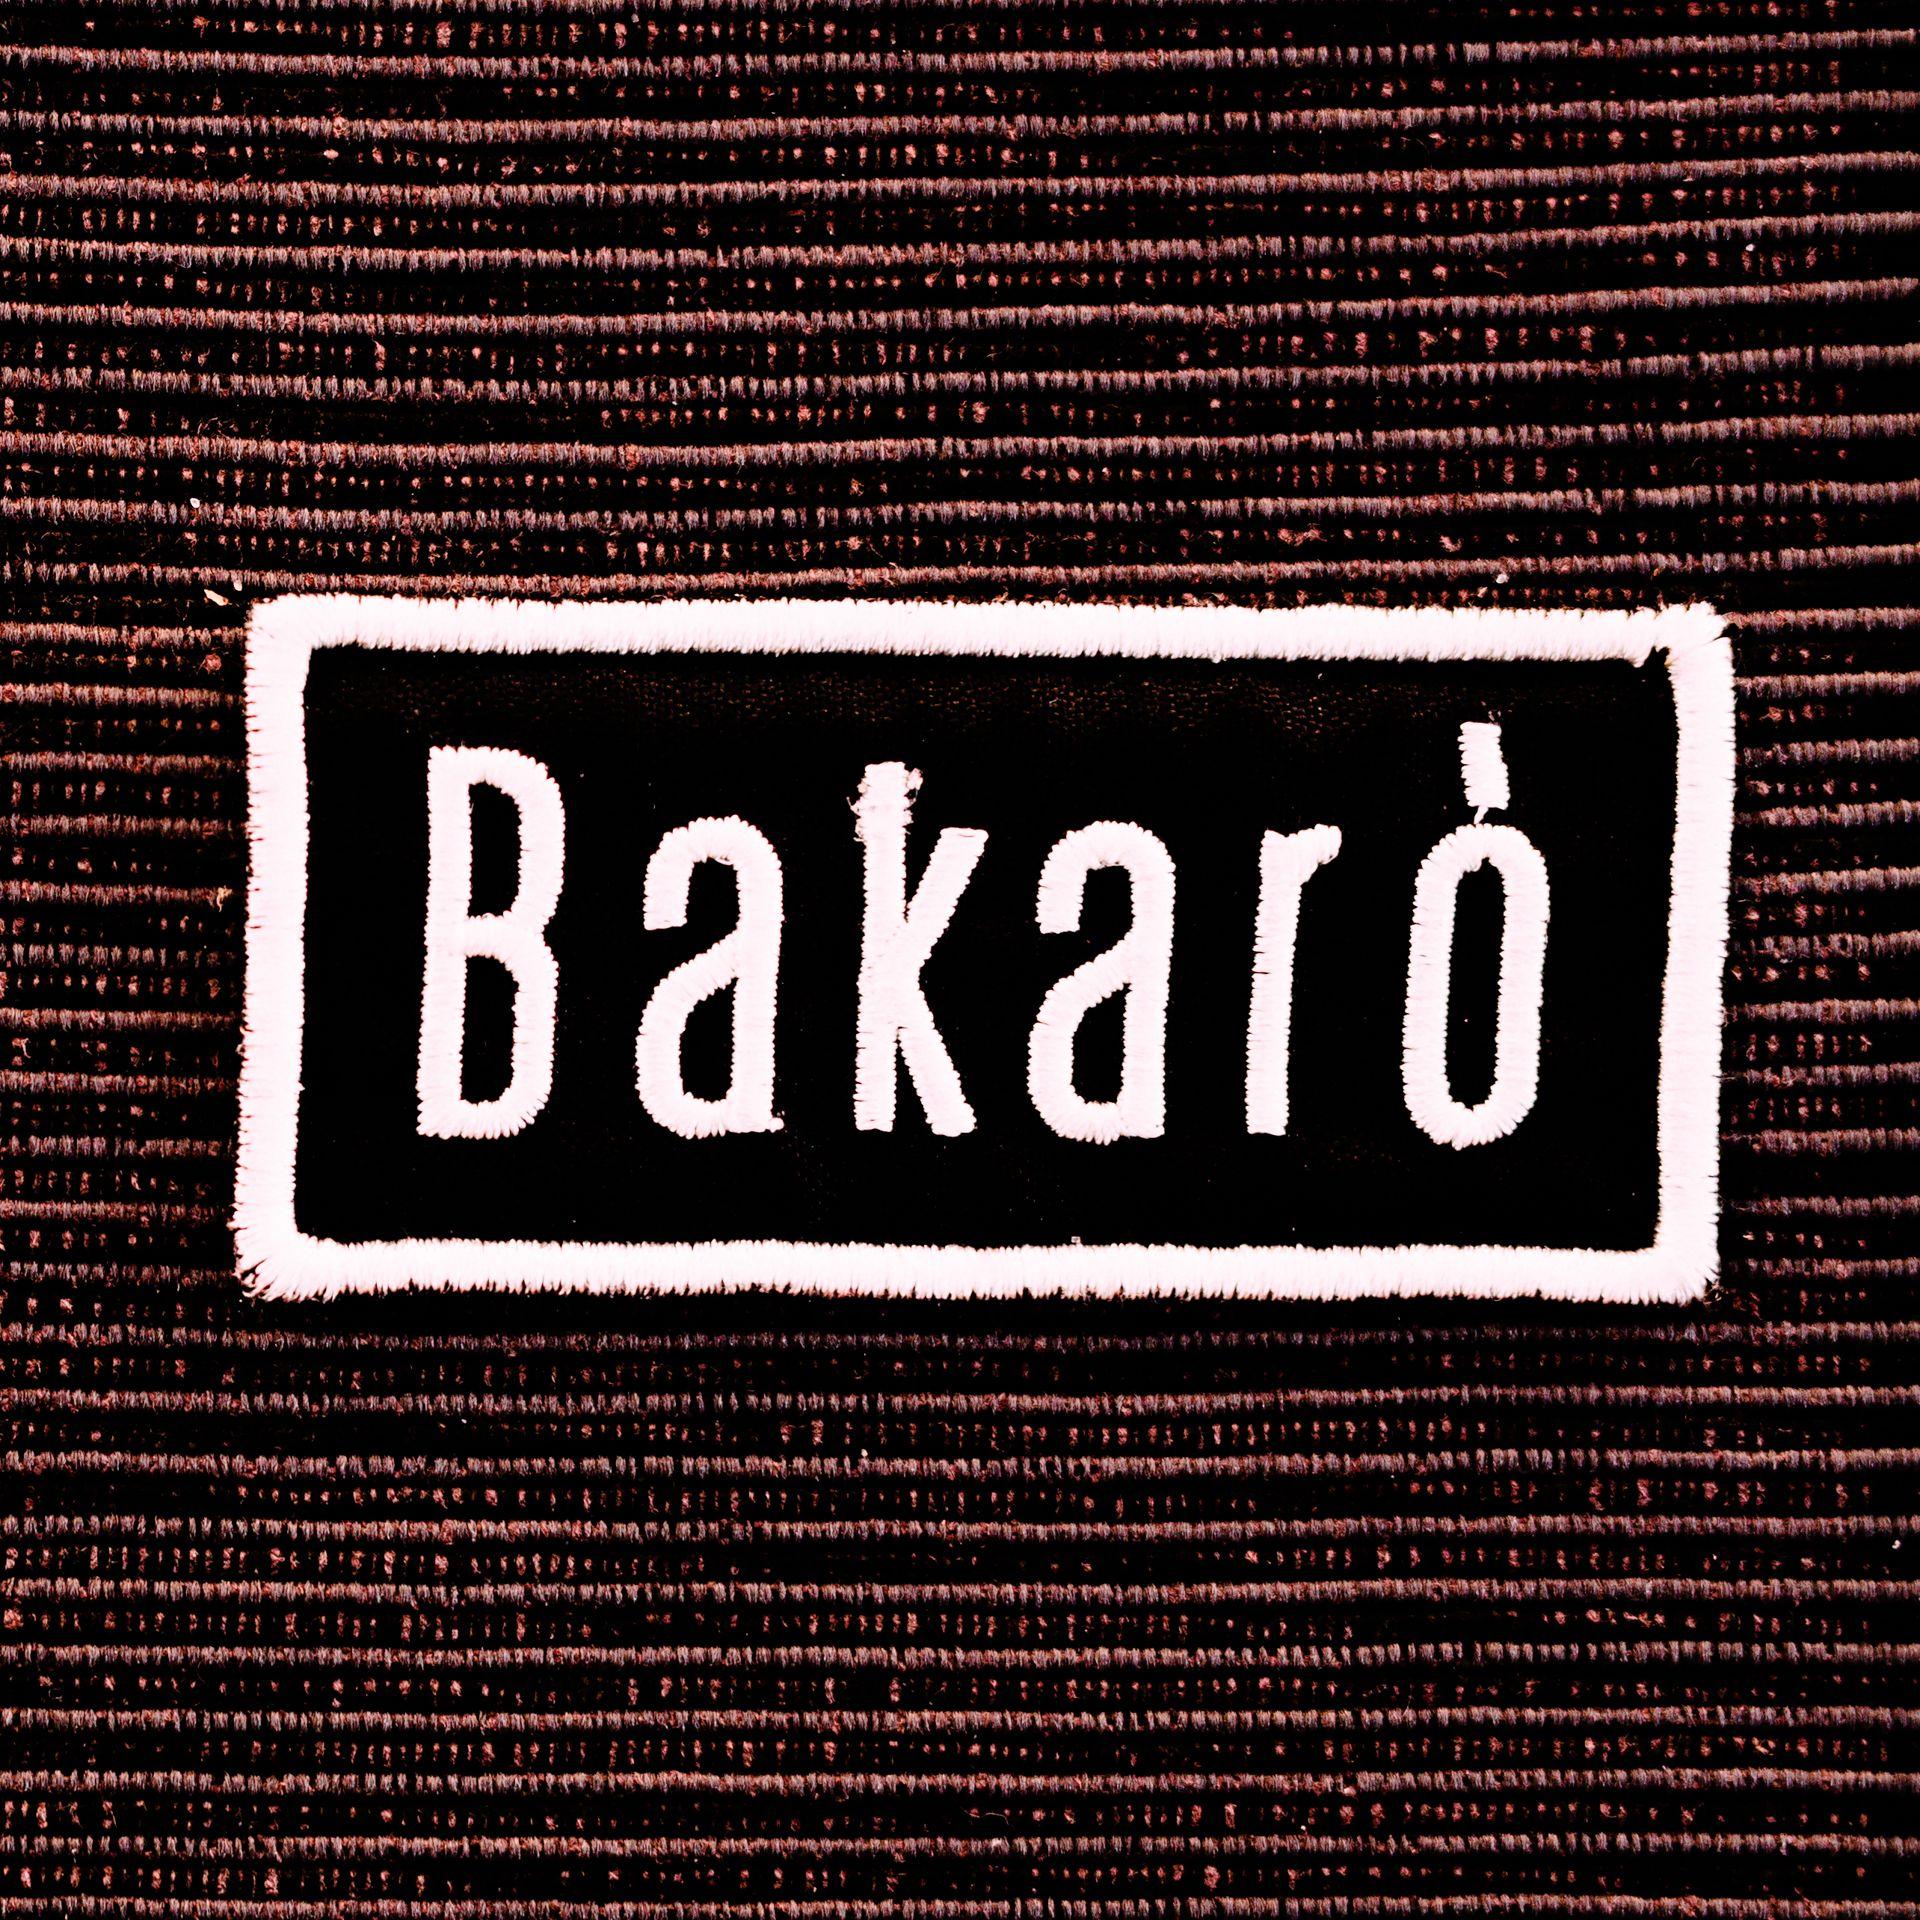 Bakaro